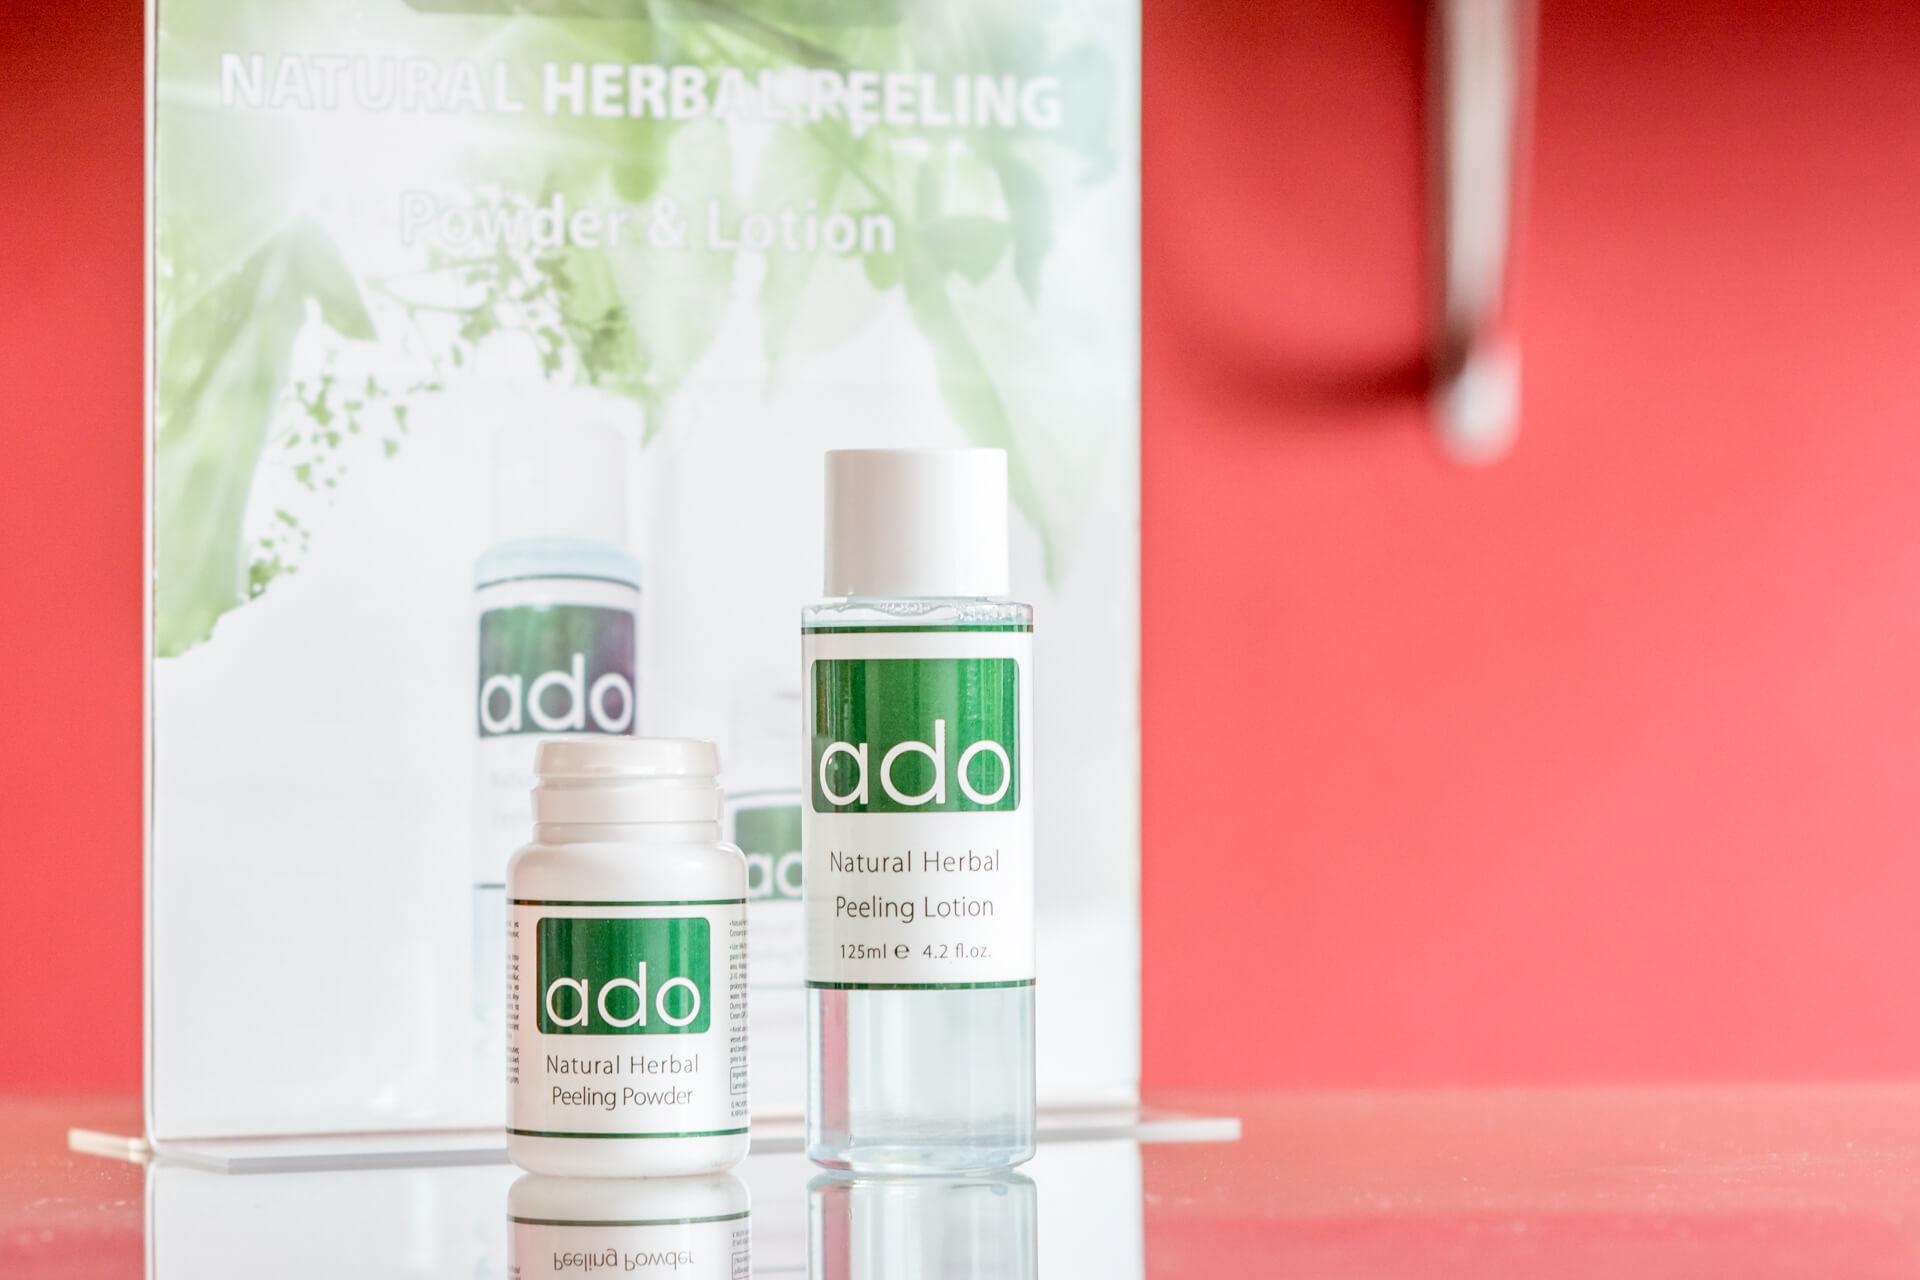 Beautysalon Davida Ado Natural Herbal Peeling